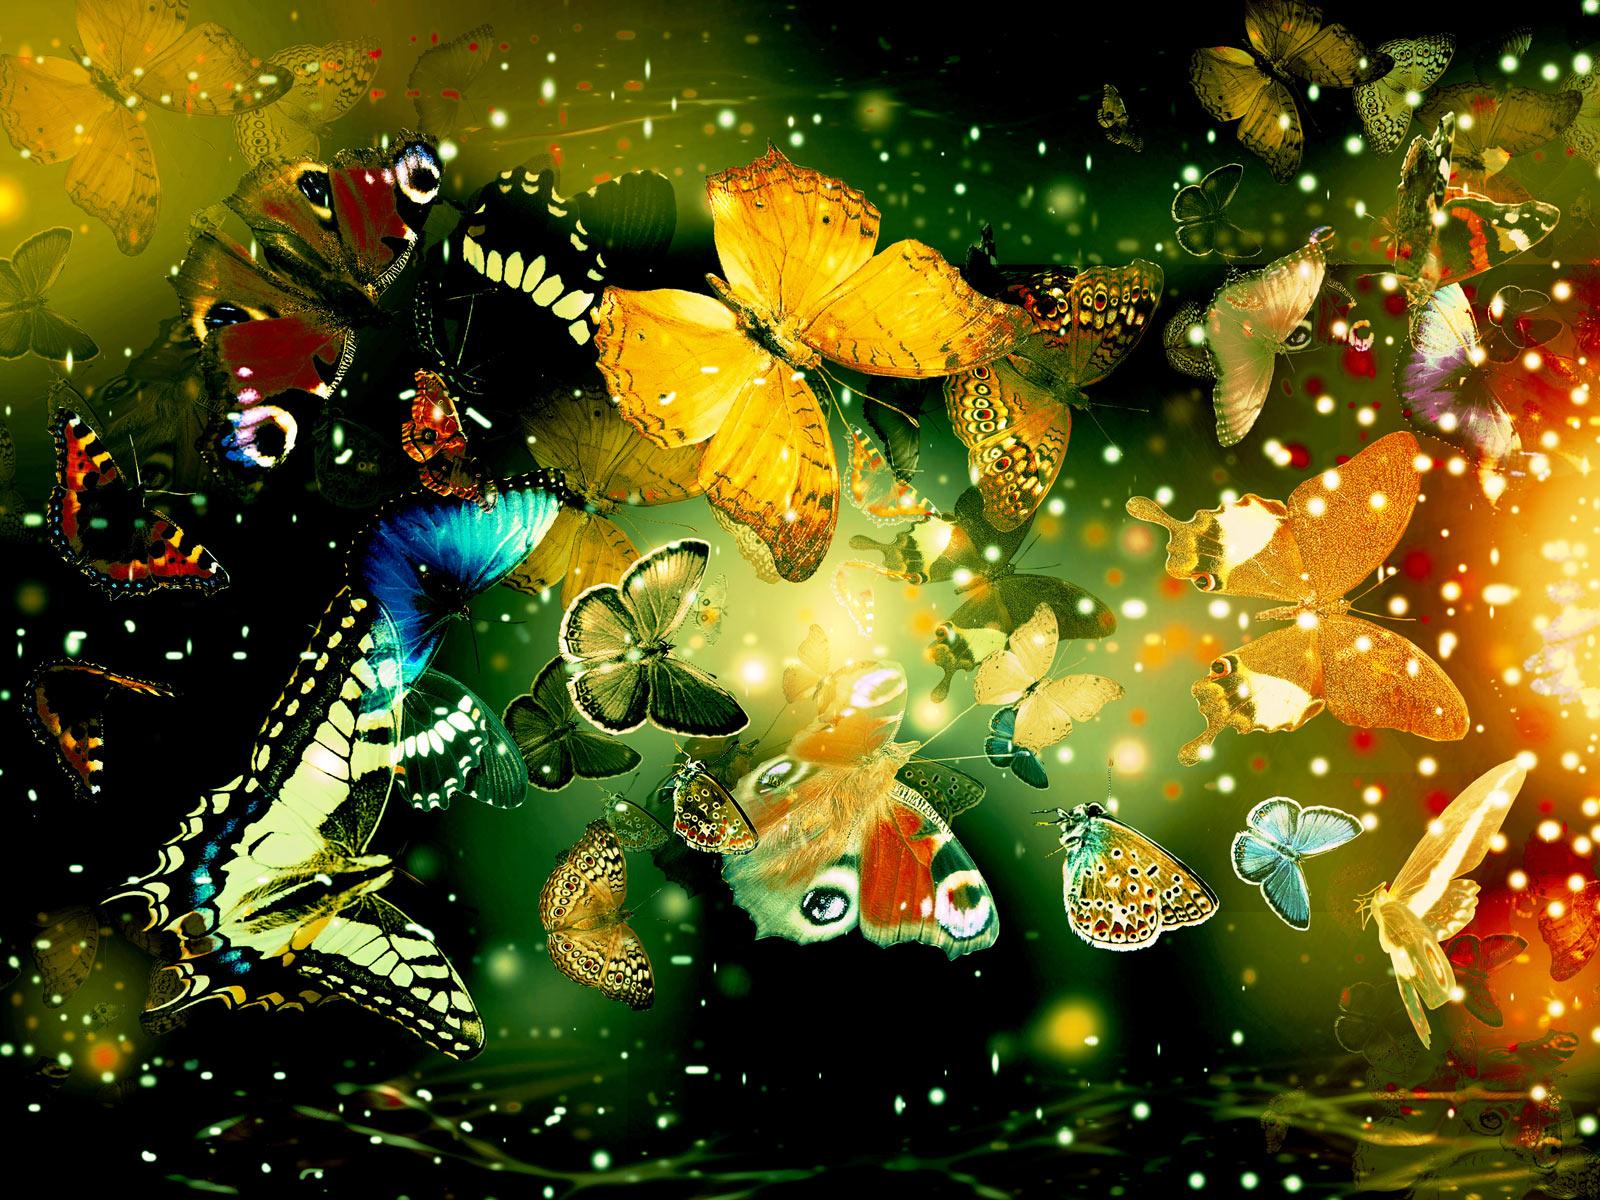 ... Wallpapers,Wallpaper Desktop,High Definition Wallpapers FREE